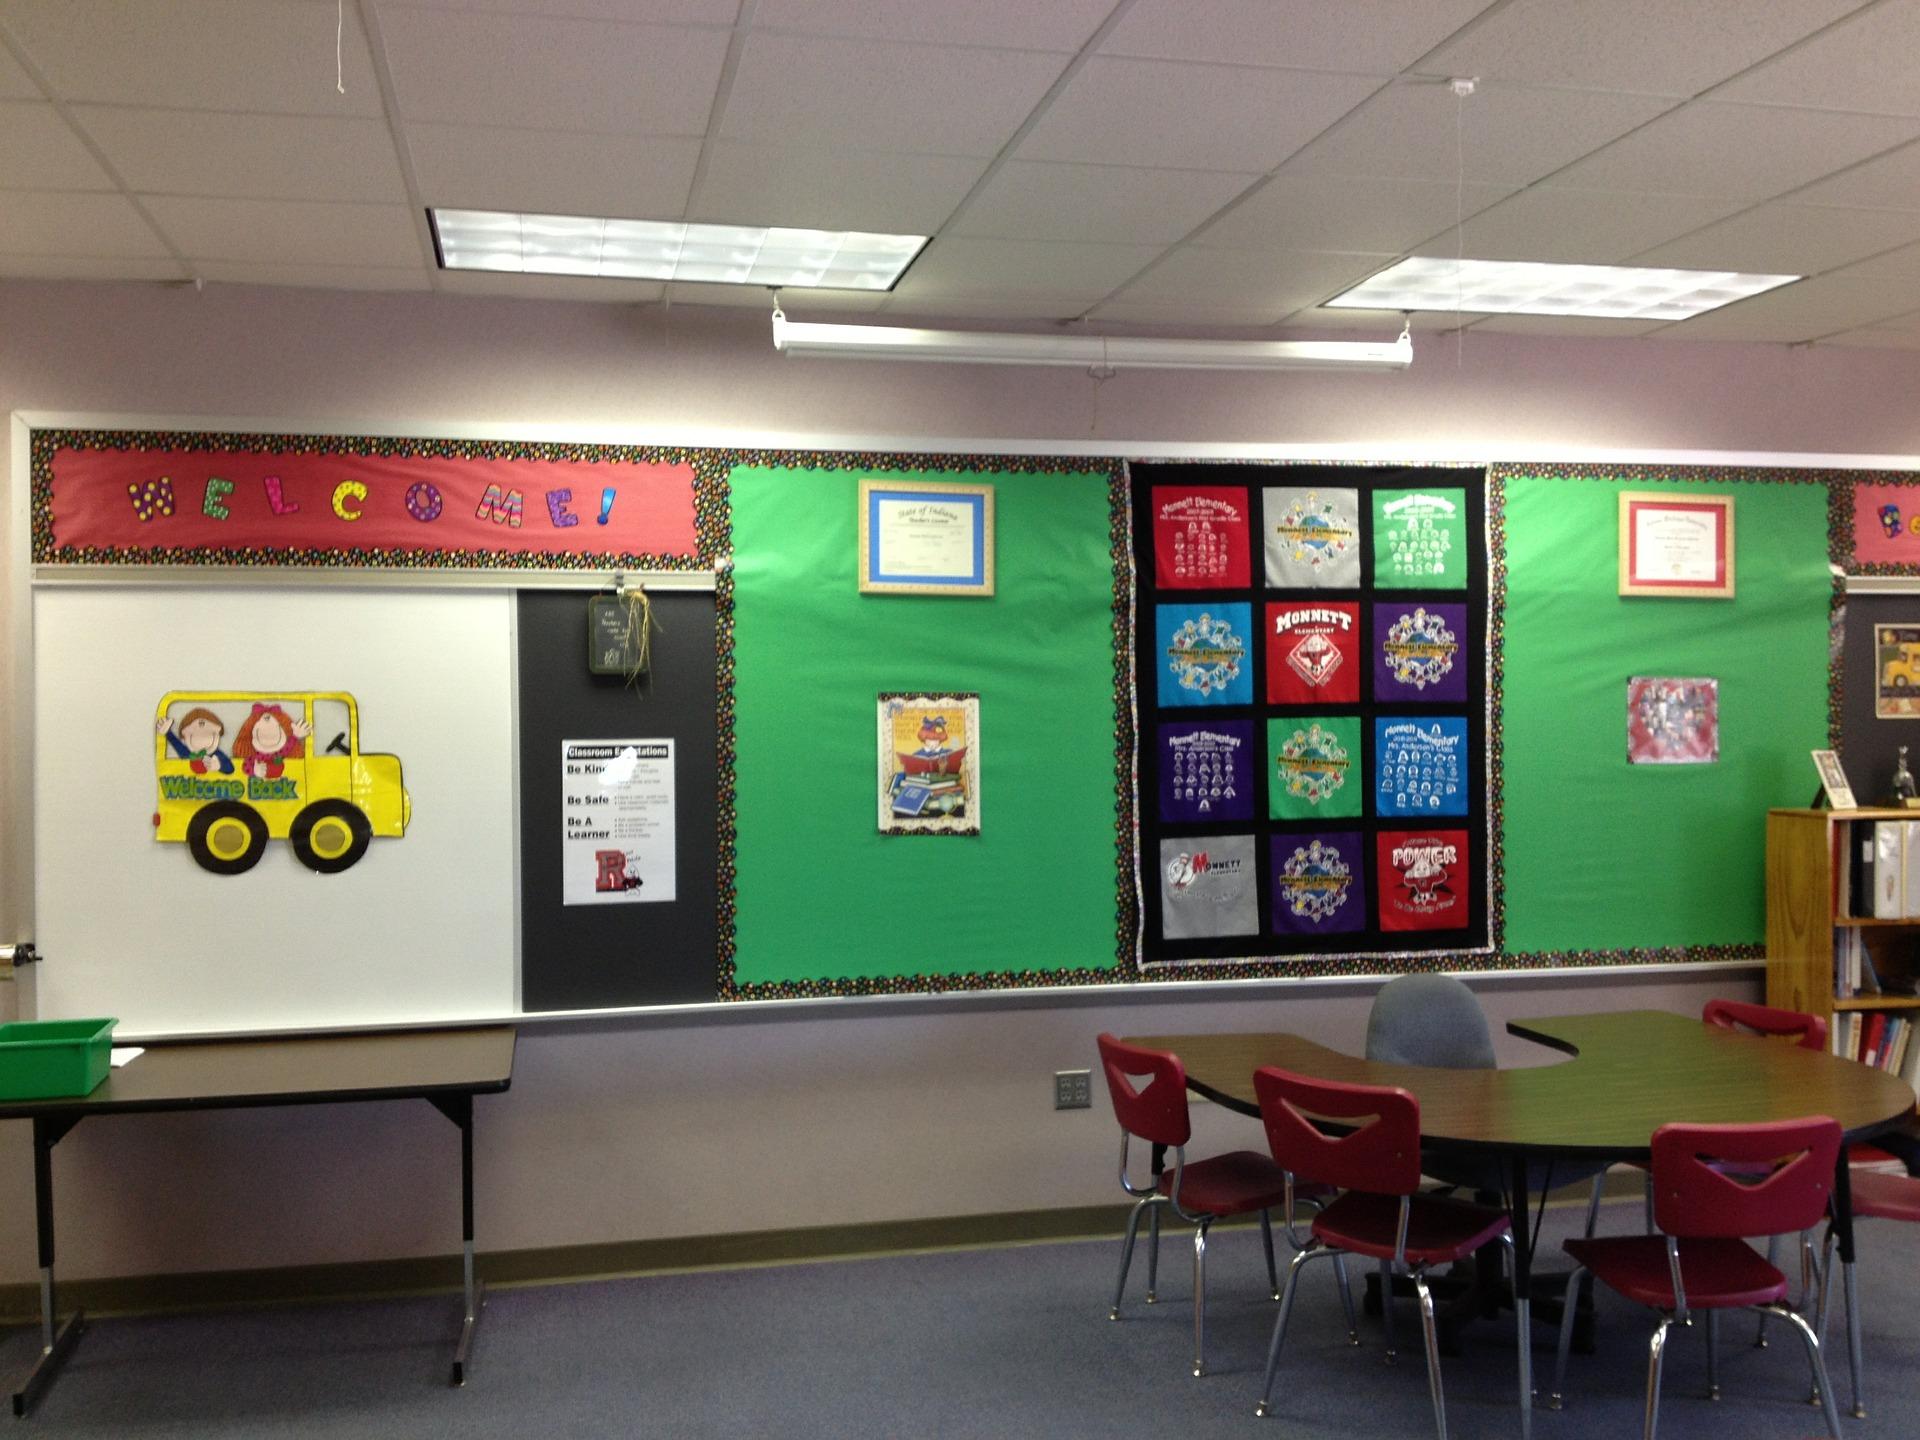 edwards & hill classroom furniture